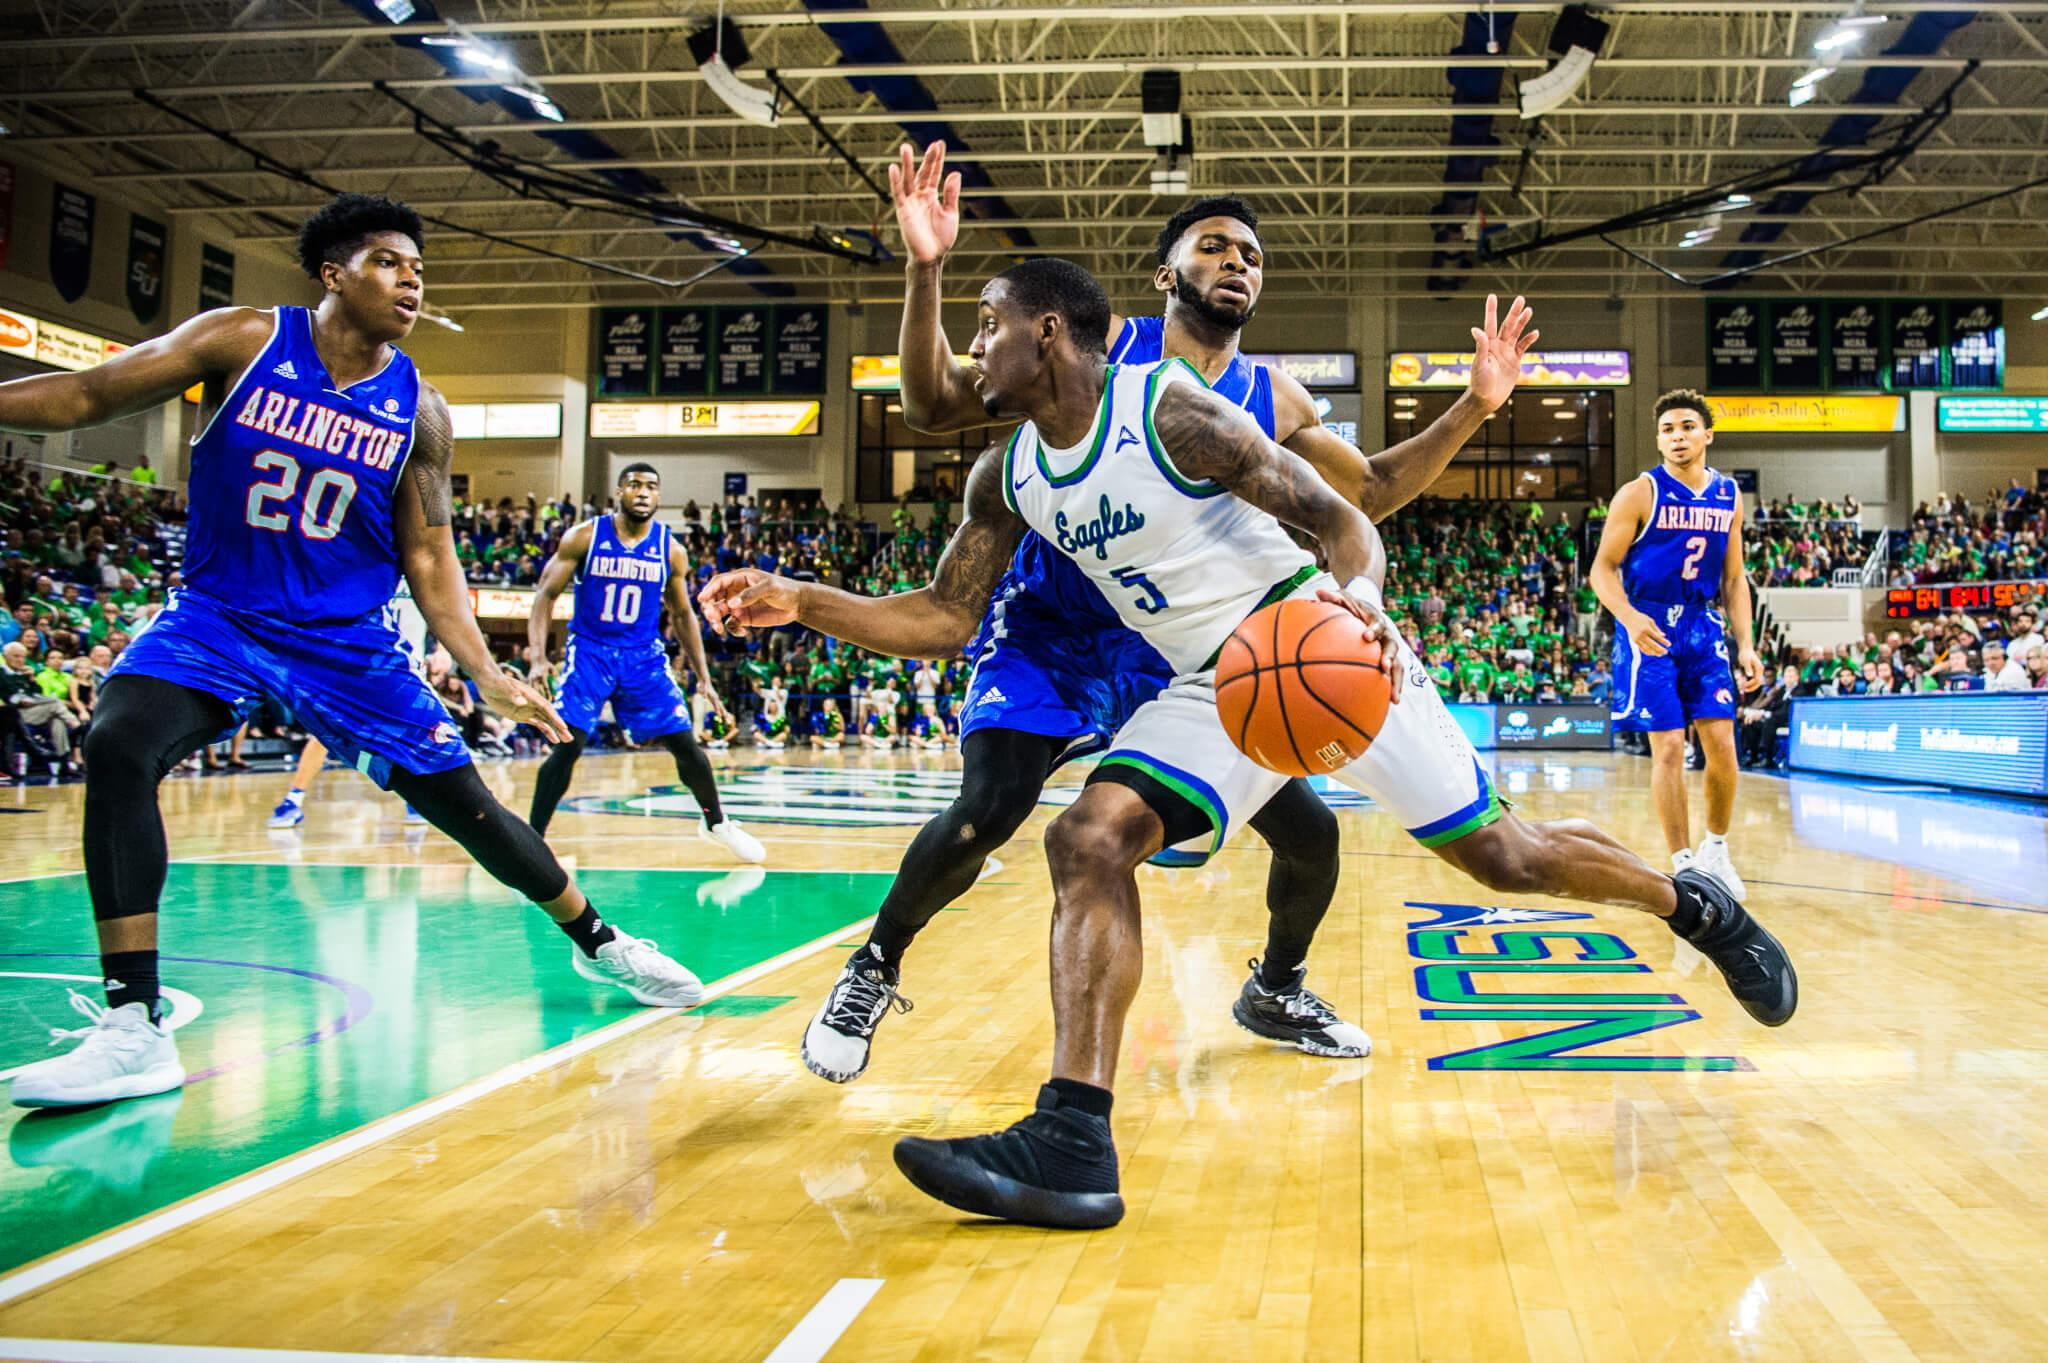 FGCU men's basketball rides big second half performance to victory